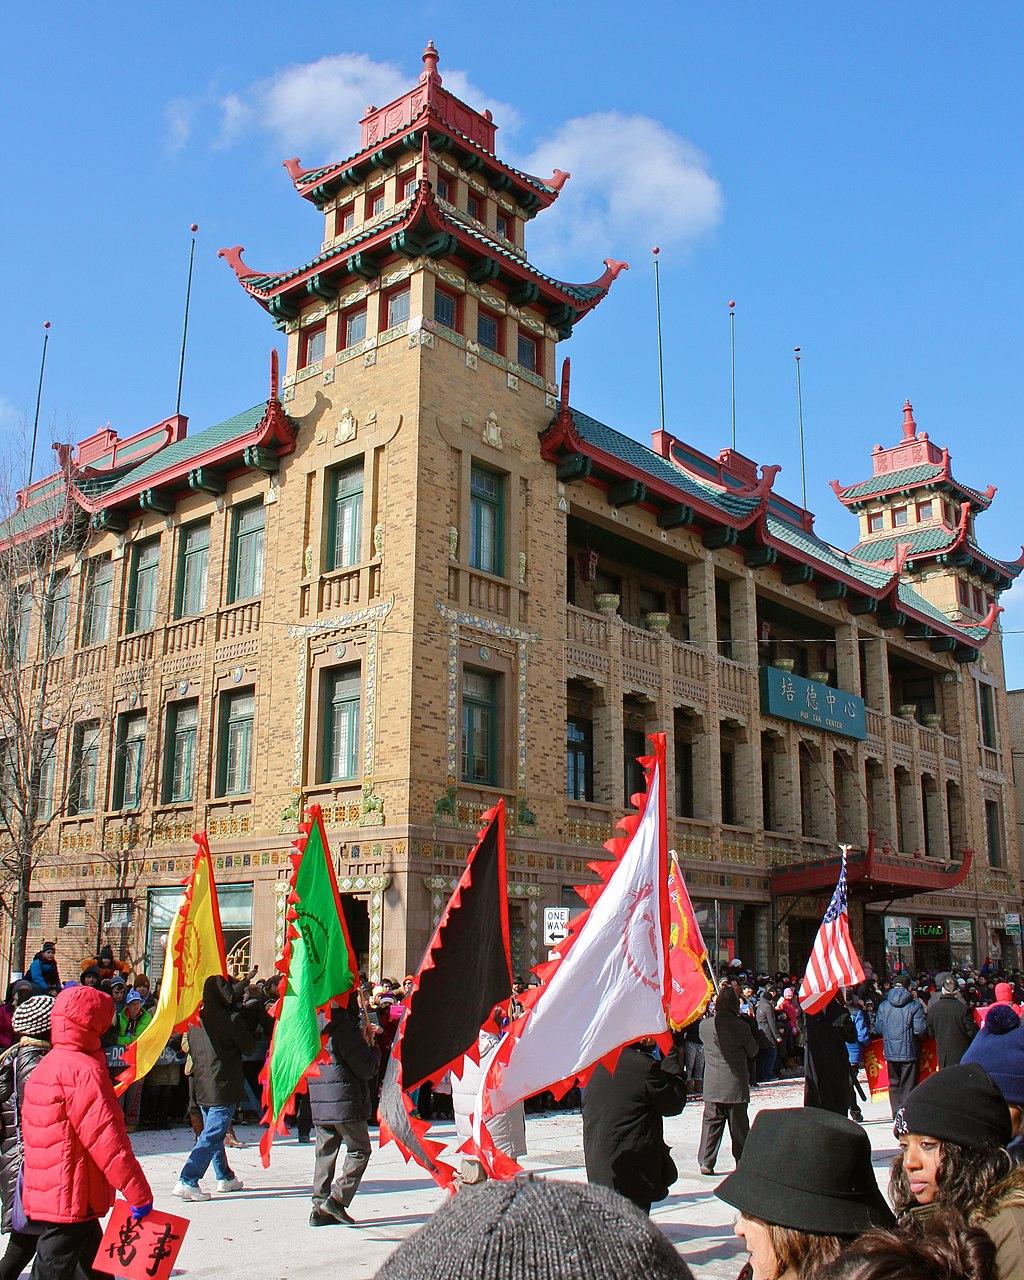 Pui Tak Center - Lunar New Year Parade - panoramio